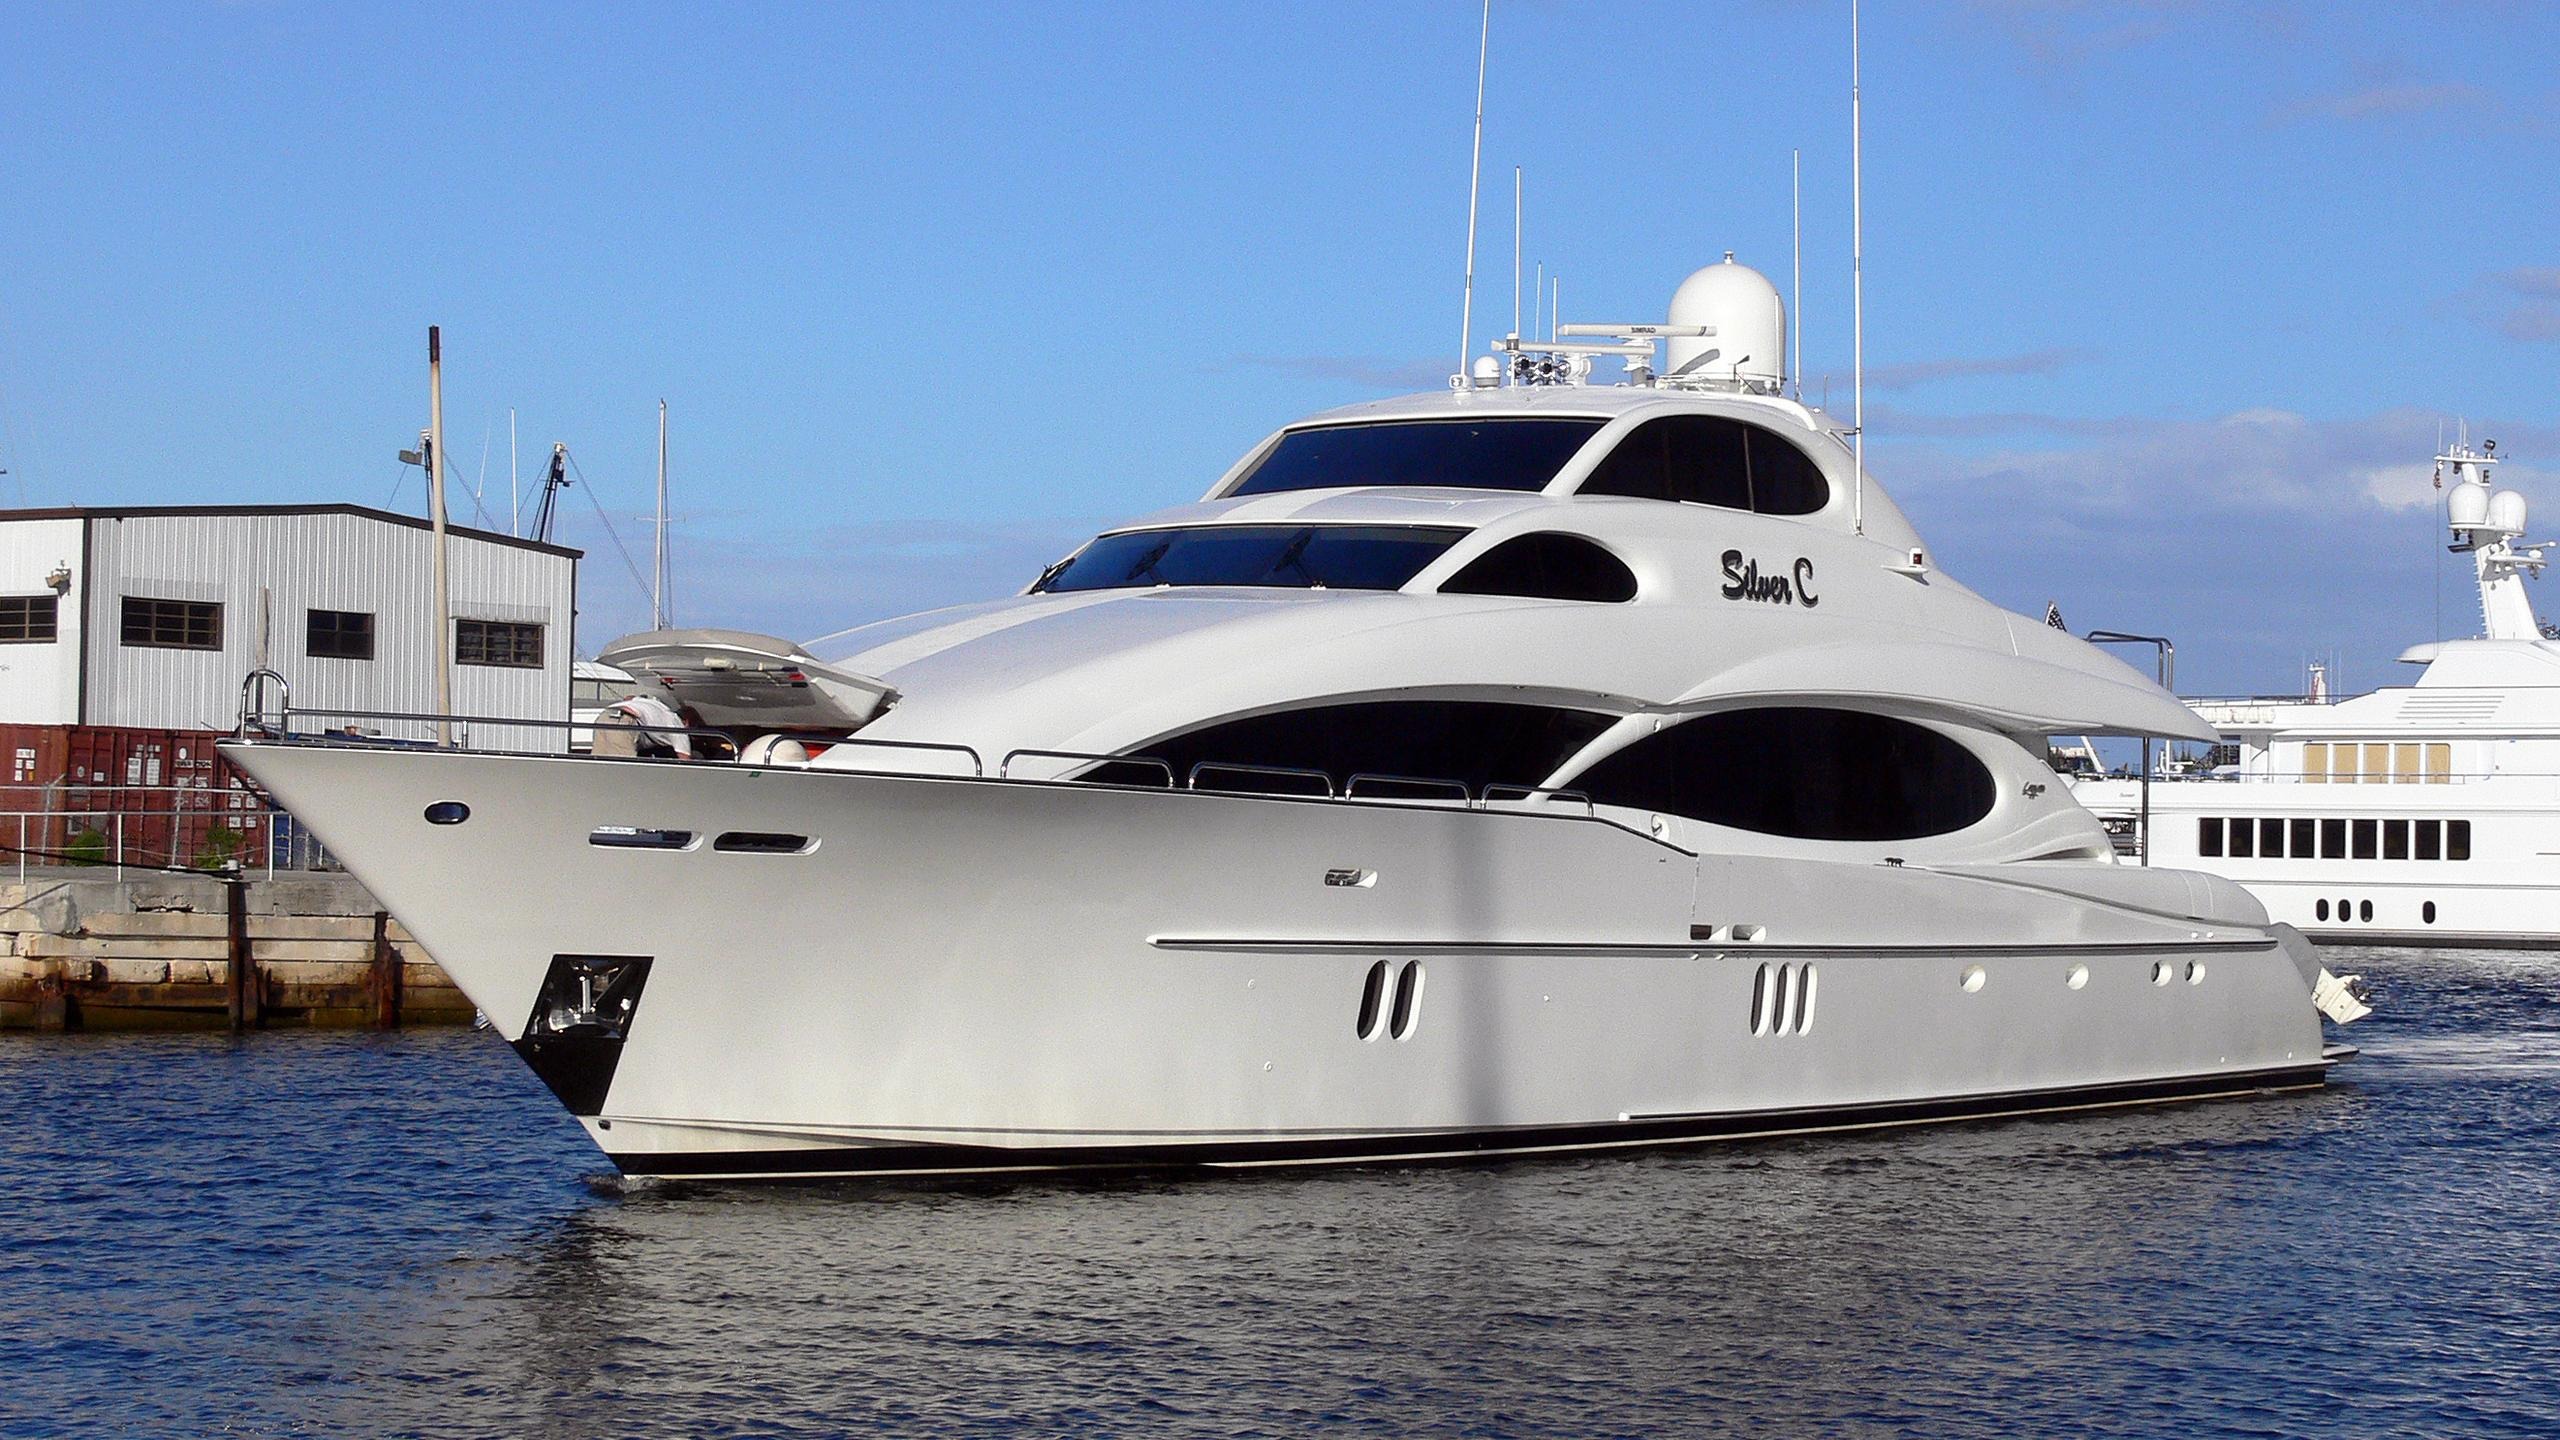 the-beeliever-halftime-motor-yacht-lazzara-2005-33m-profile